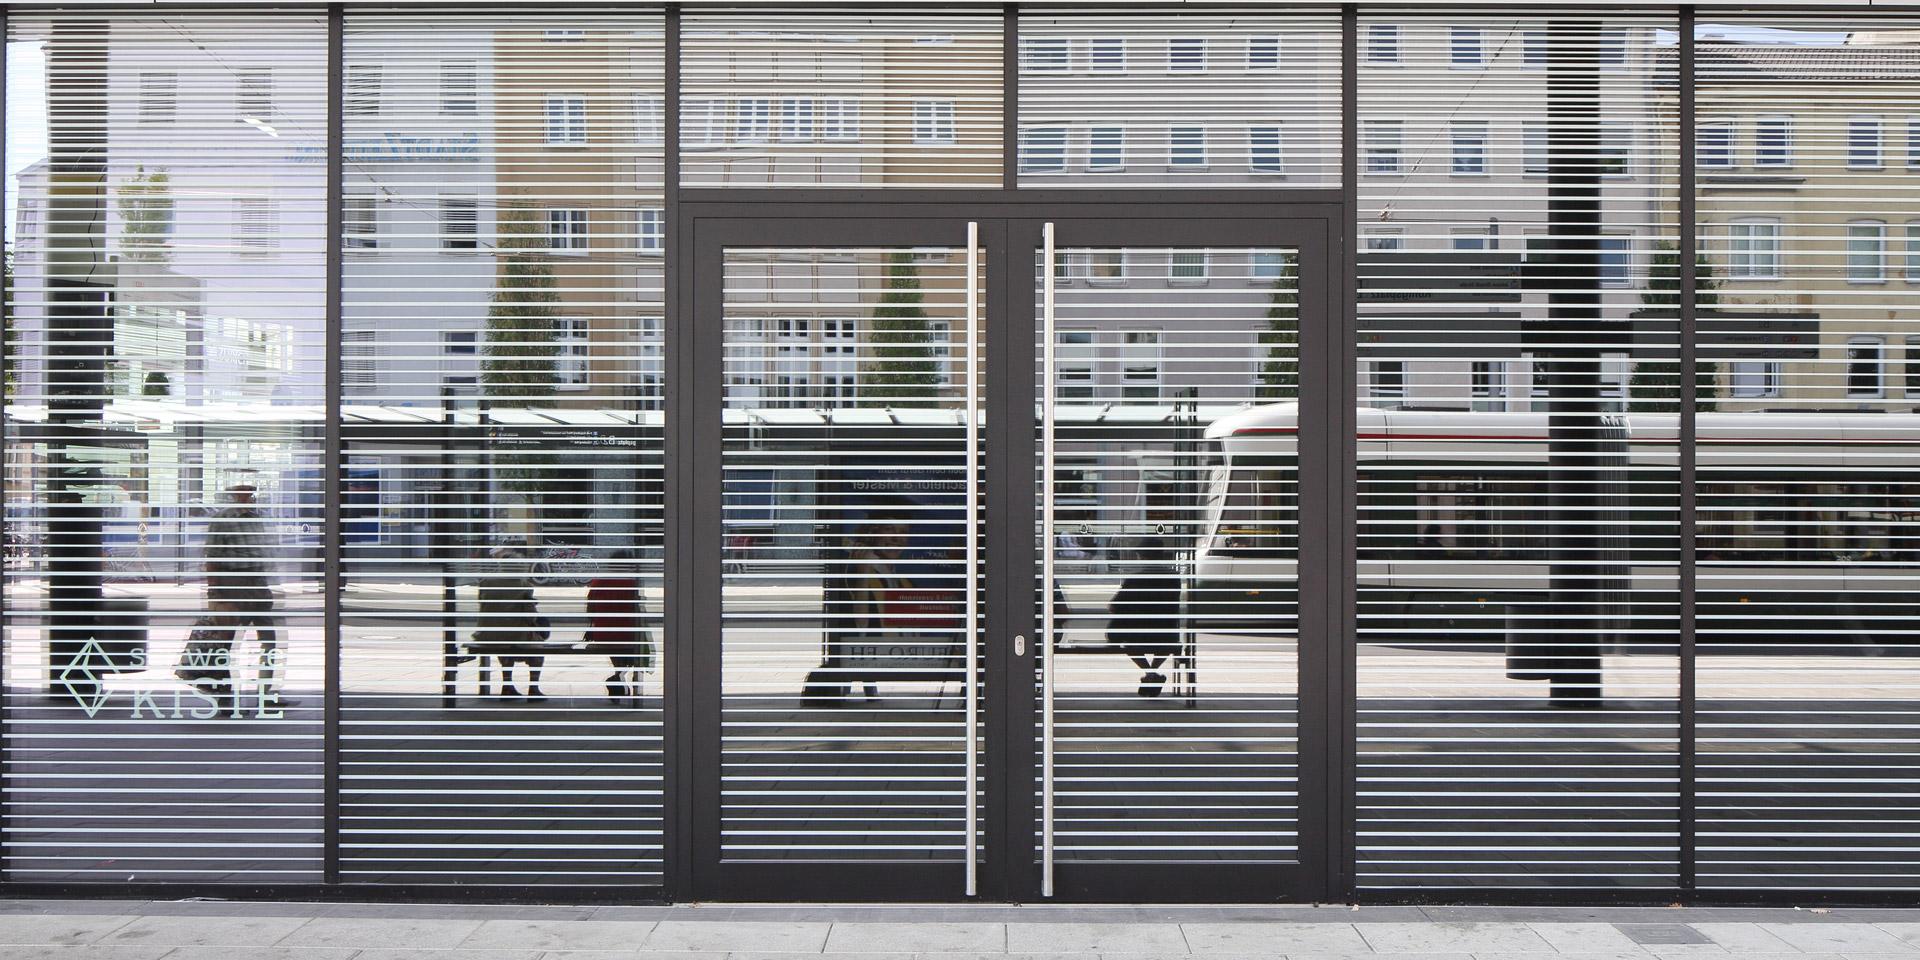 Lackierte Fassadenprofile am Königsplatz in Augsburg